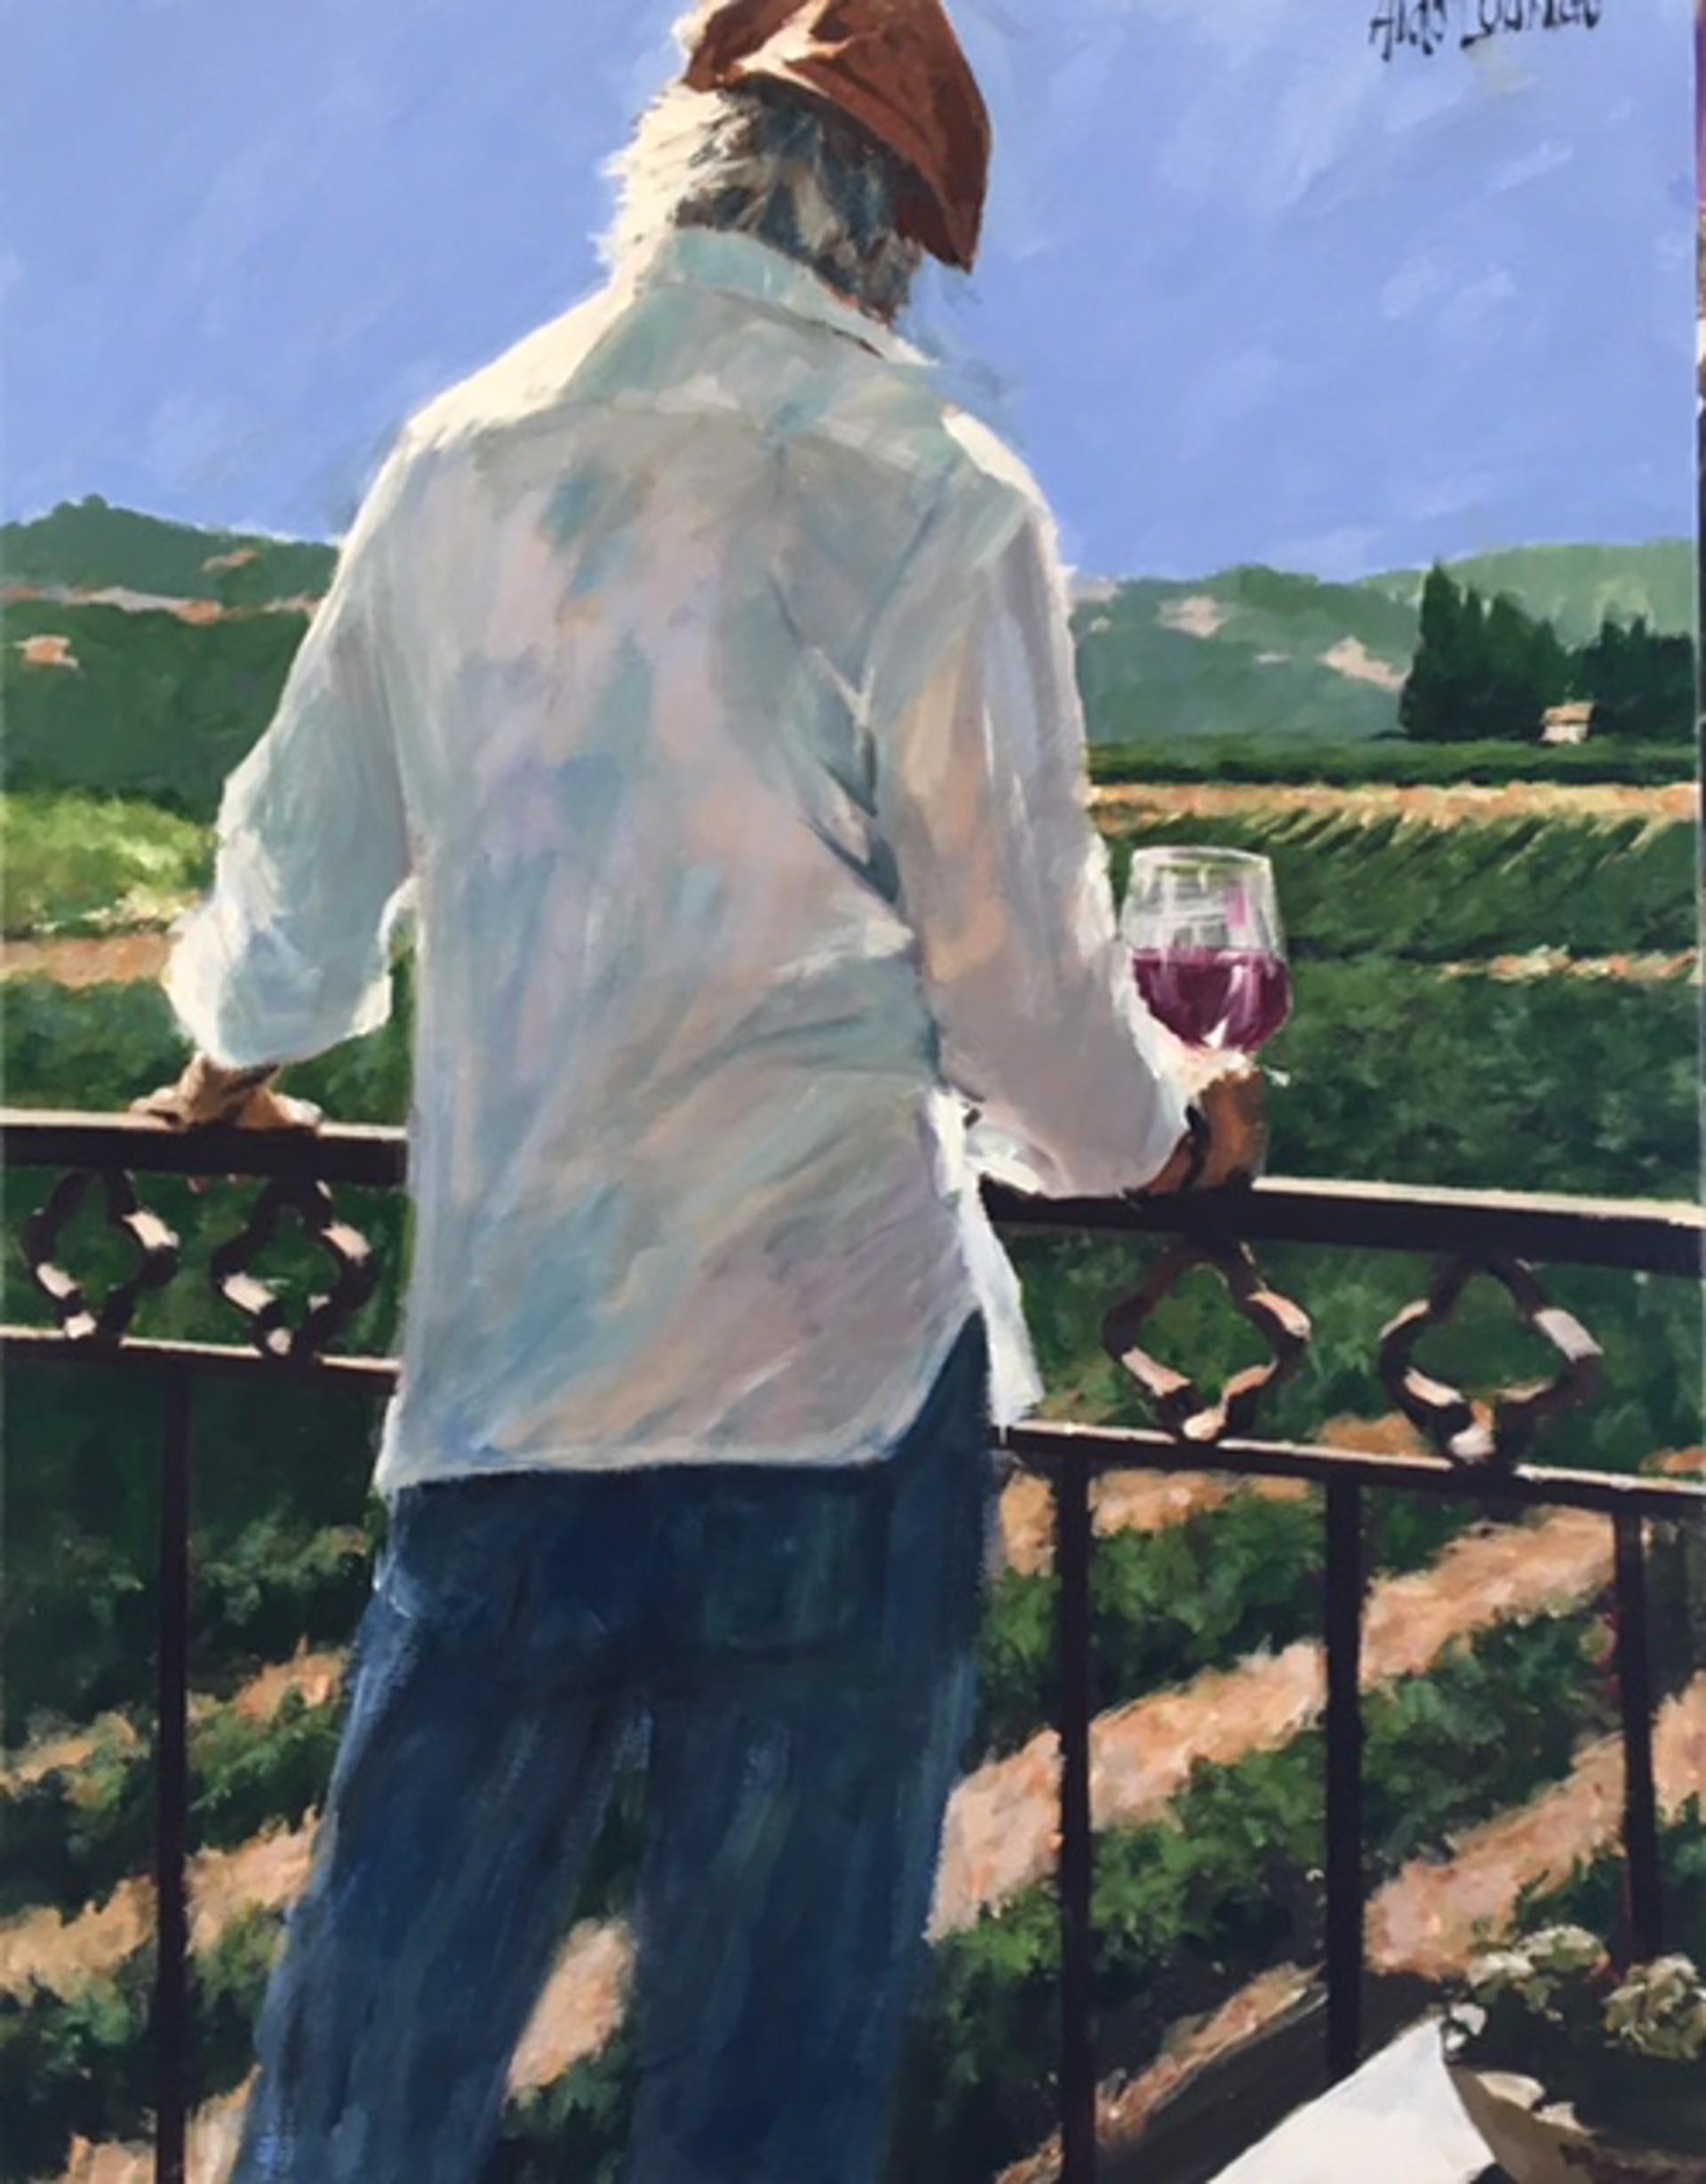 At Sunstone Santa Ynez by Aldo Luongo